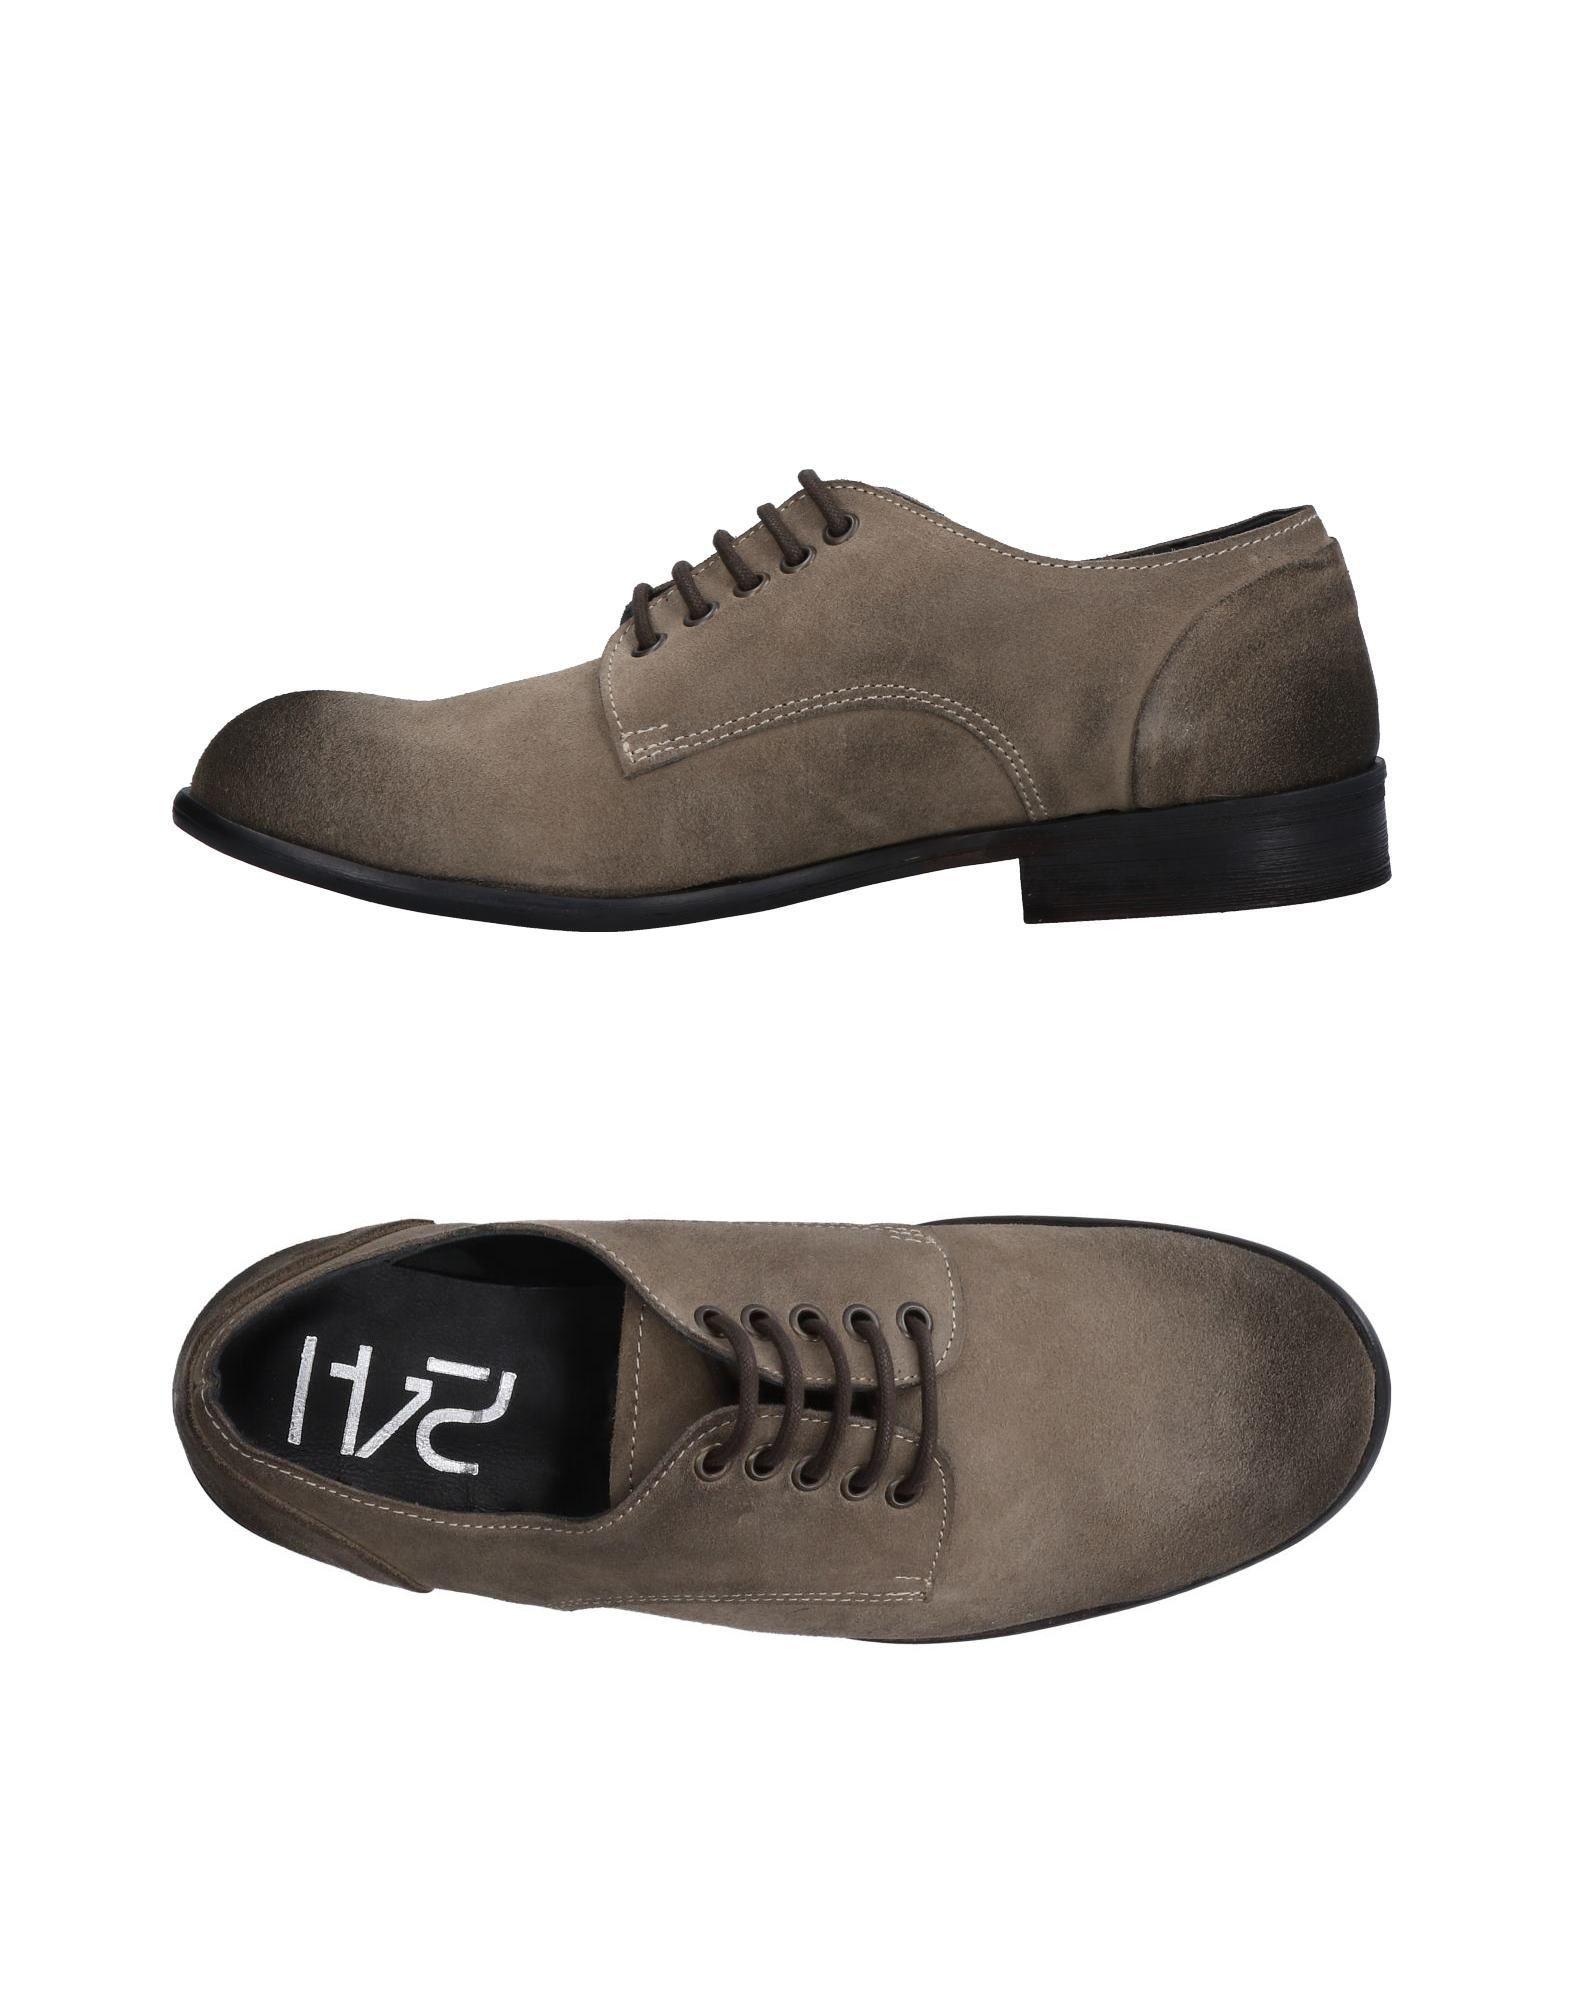 241 Обувь на шнурках обувь ламода